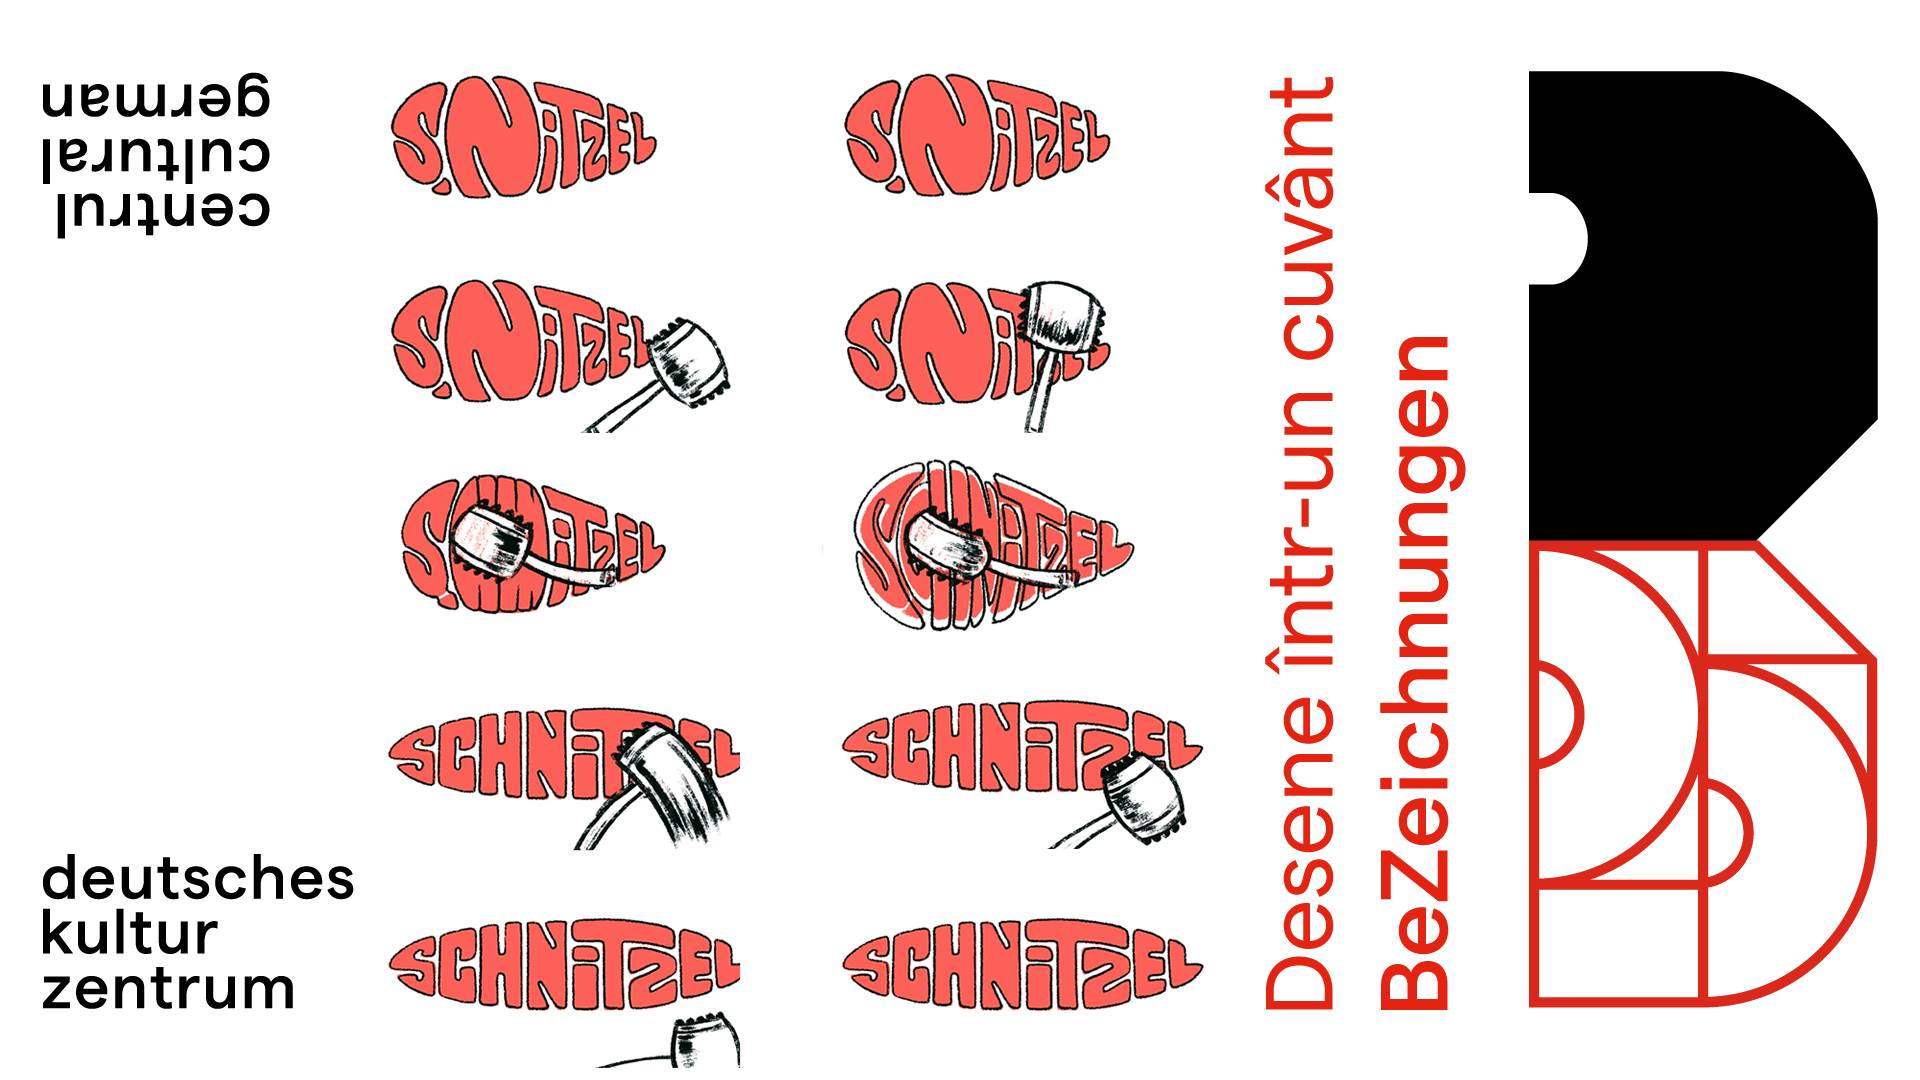 Comics-Launch Desene într-un cuvânt BeZeichnungen